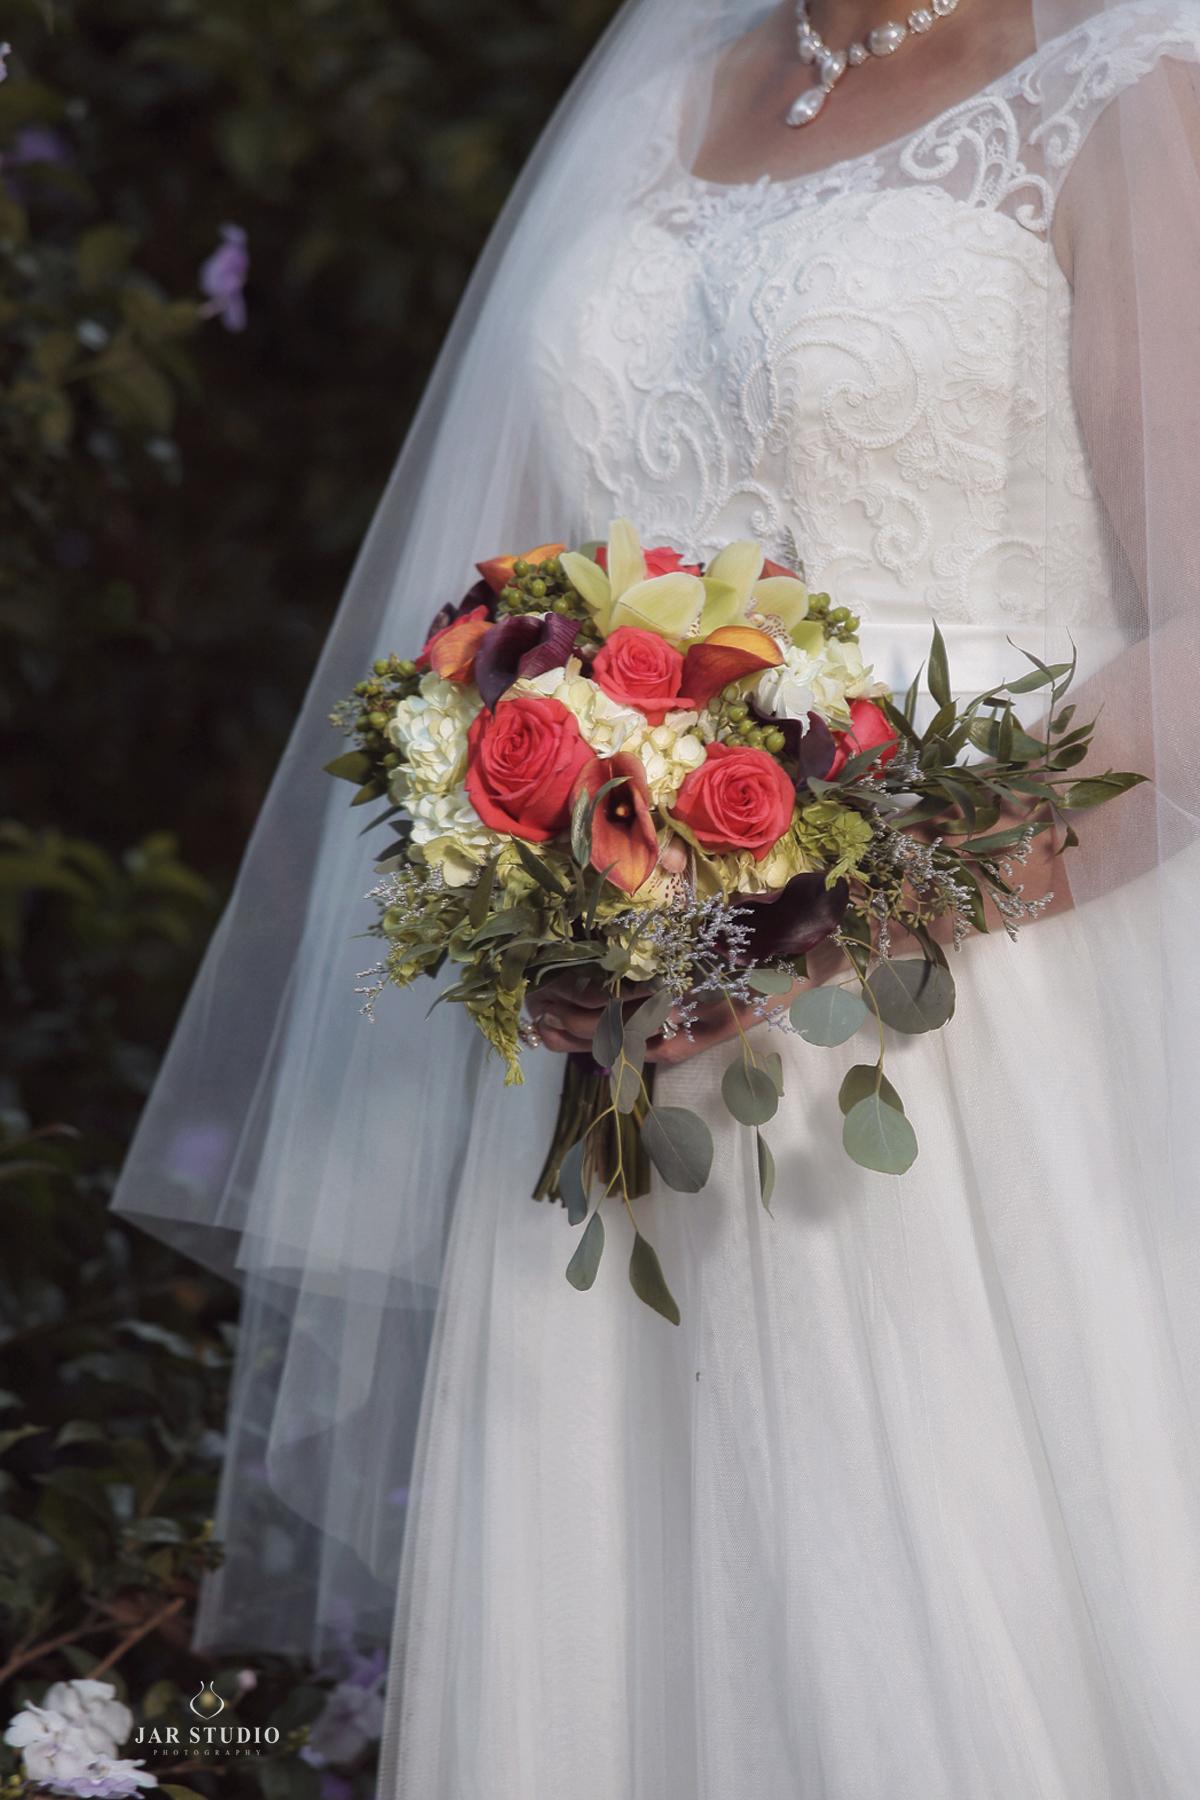 02-bright-Cascading-Bridal-Bouquet-jarstudio-orlando-fl.JPG